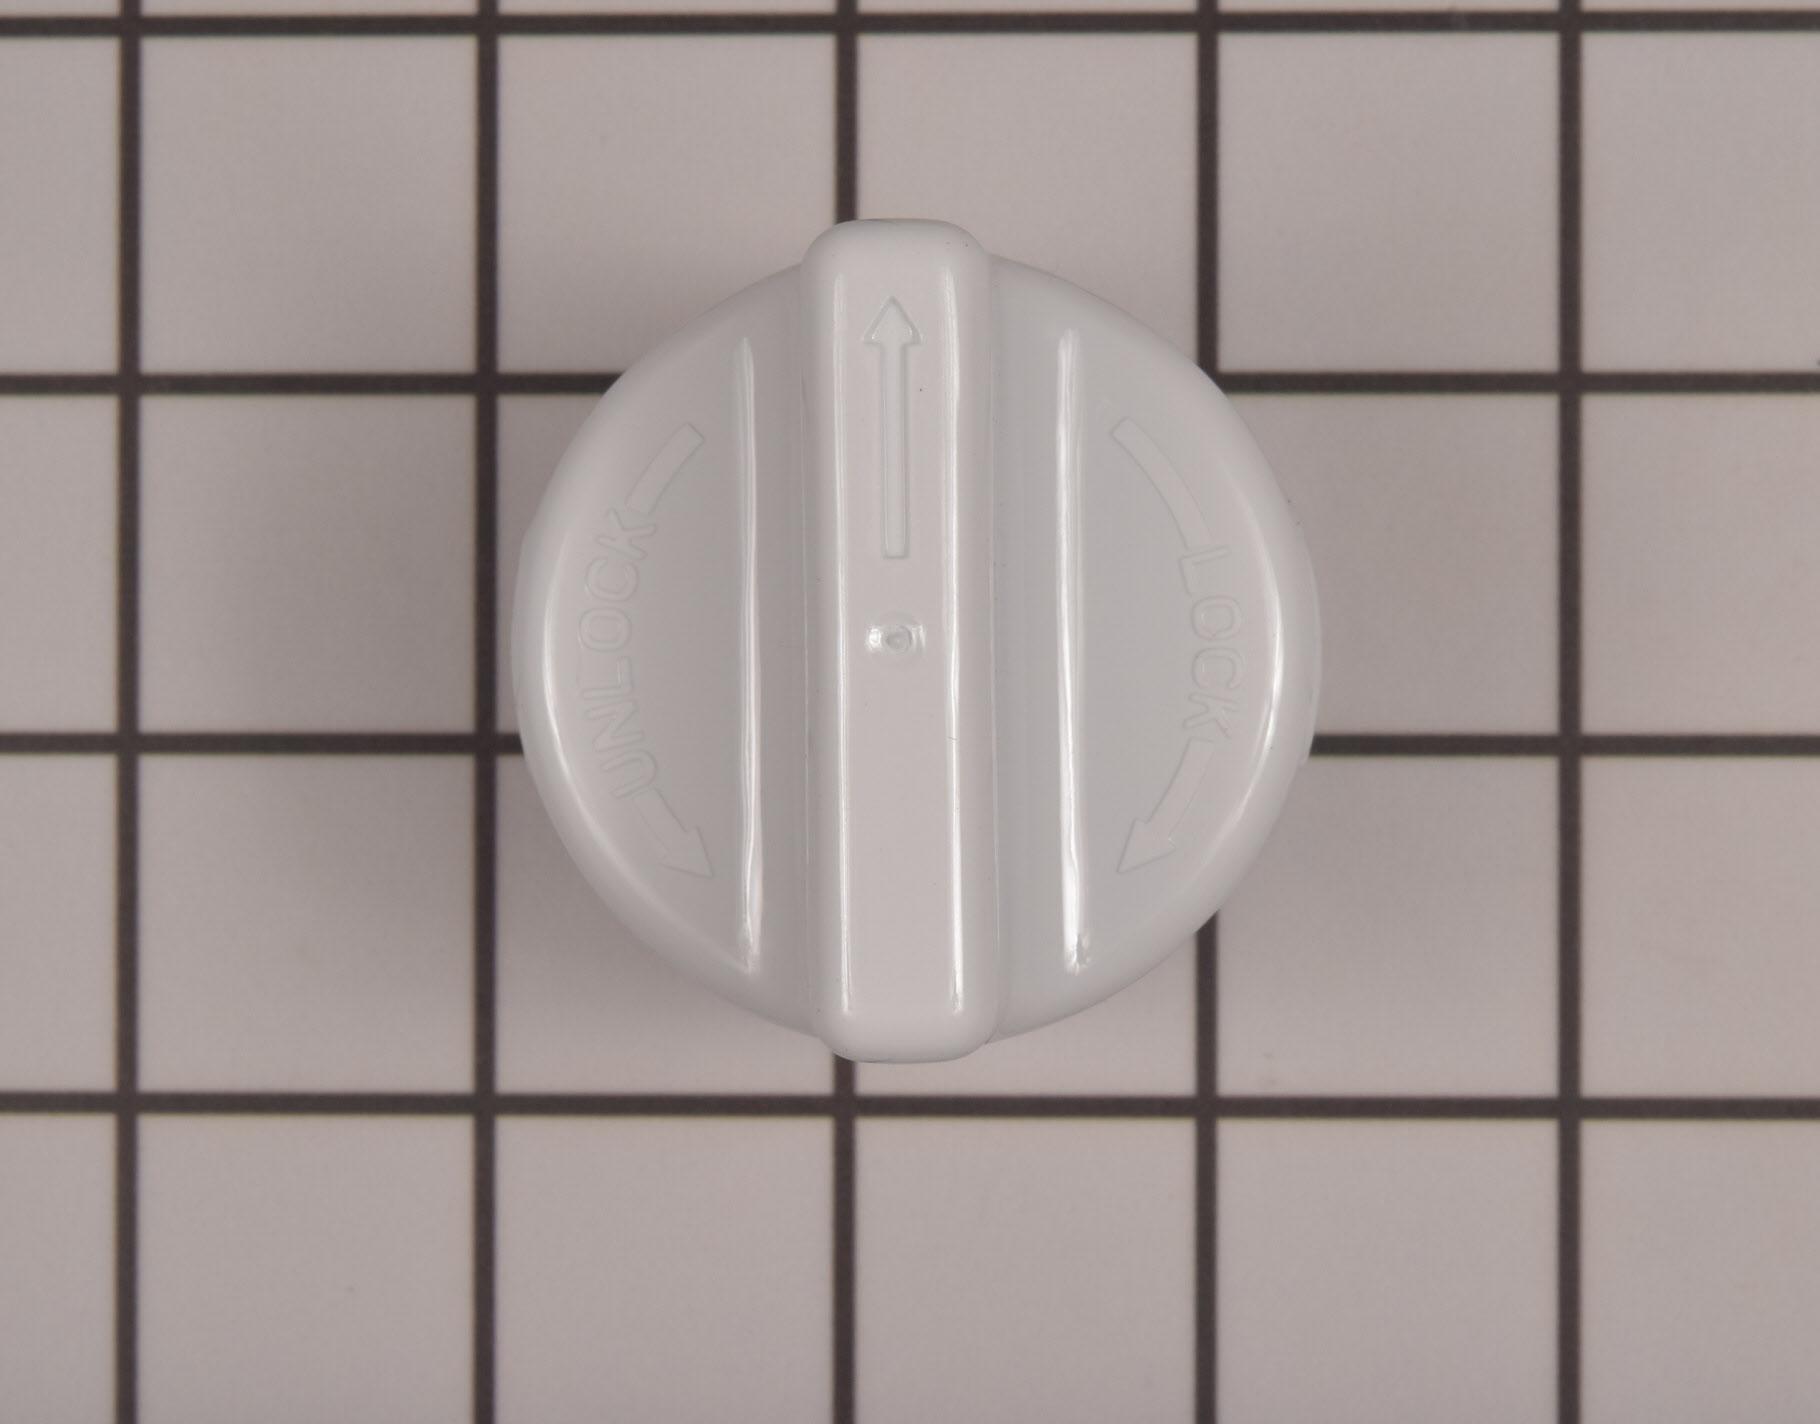 KitchenAid Refrigerator Part # W11189114 - Cap